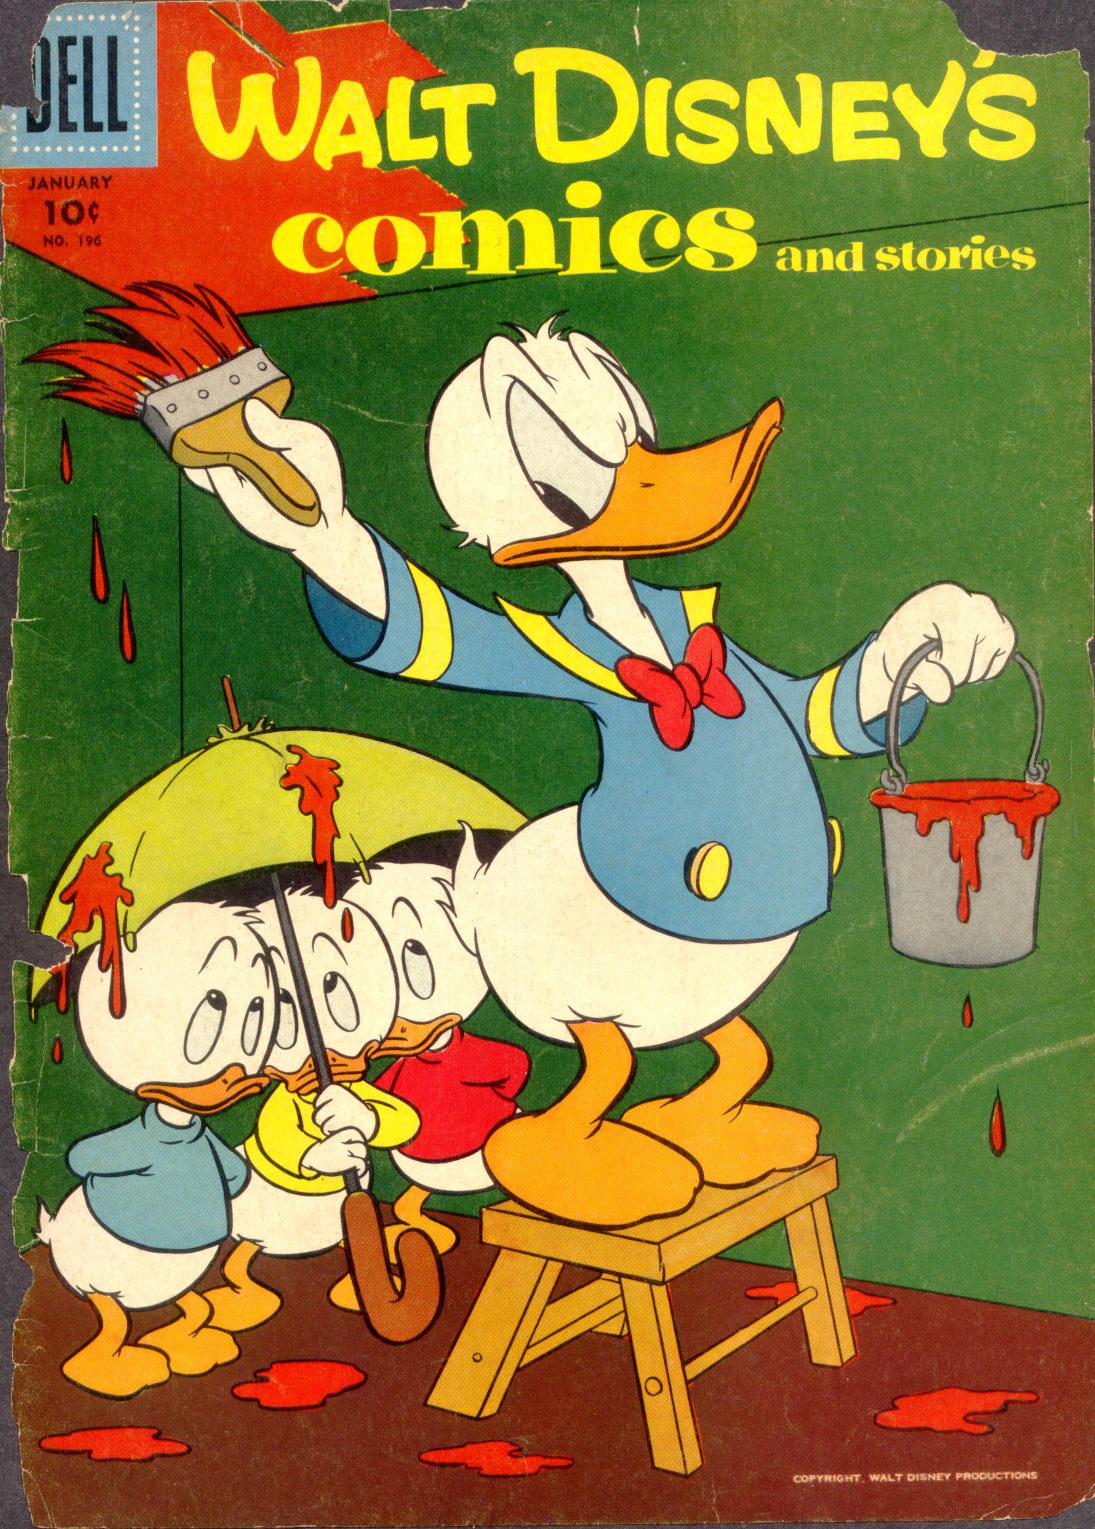 Walt Disneys Comics and Stories 196 Page 1